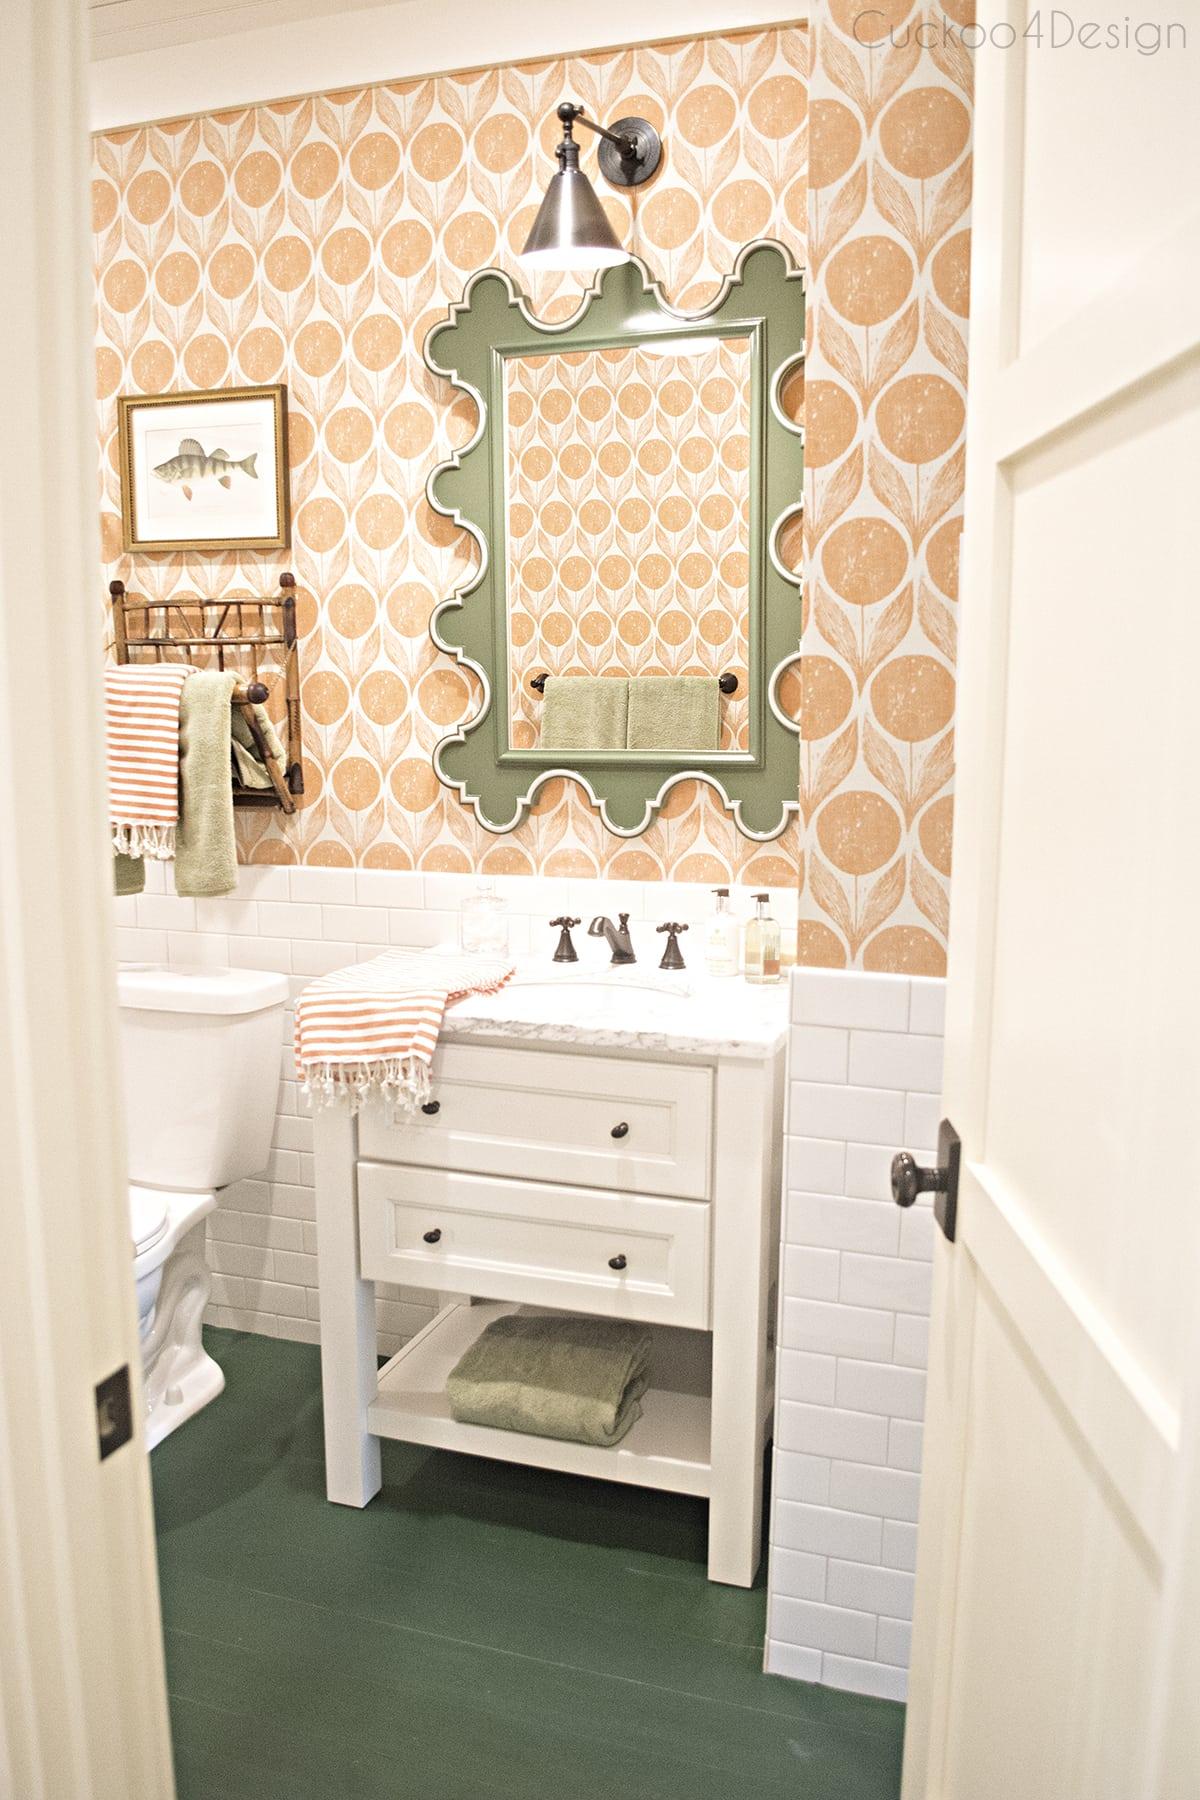 Romo Clementine wallpaper, green scalloped mirror with orange wallpaper in bathroom